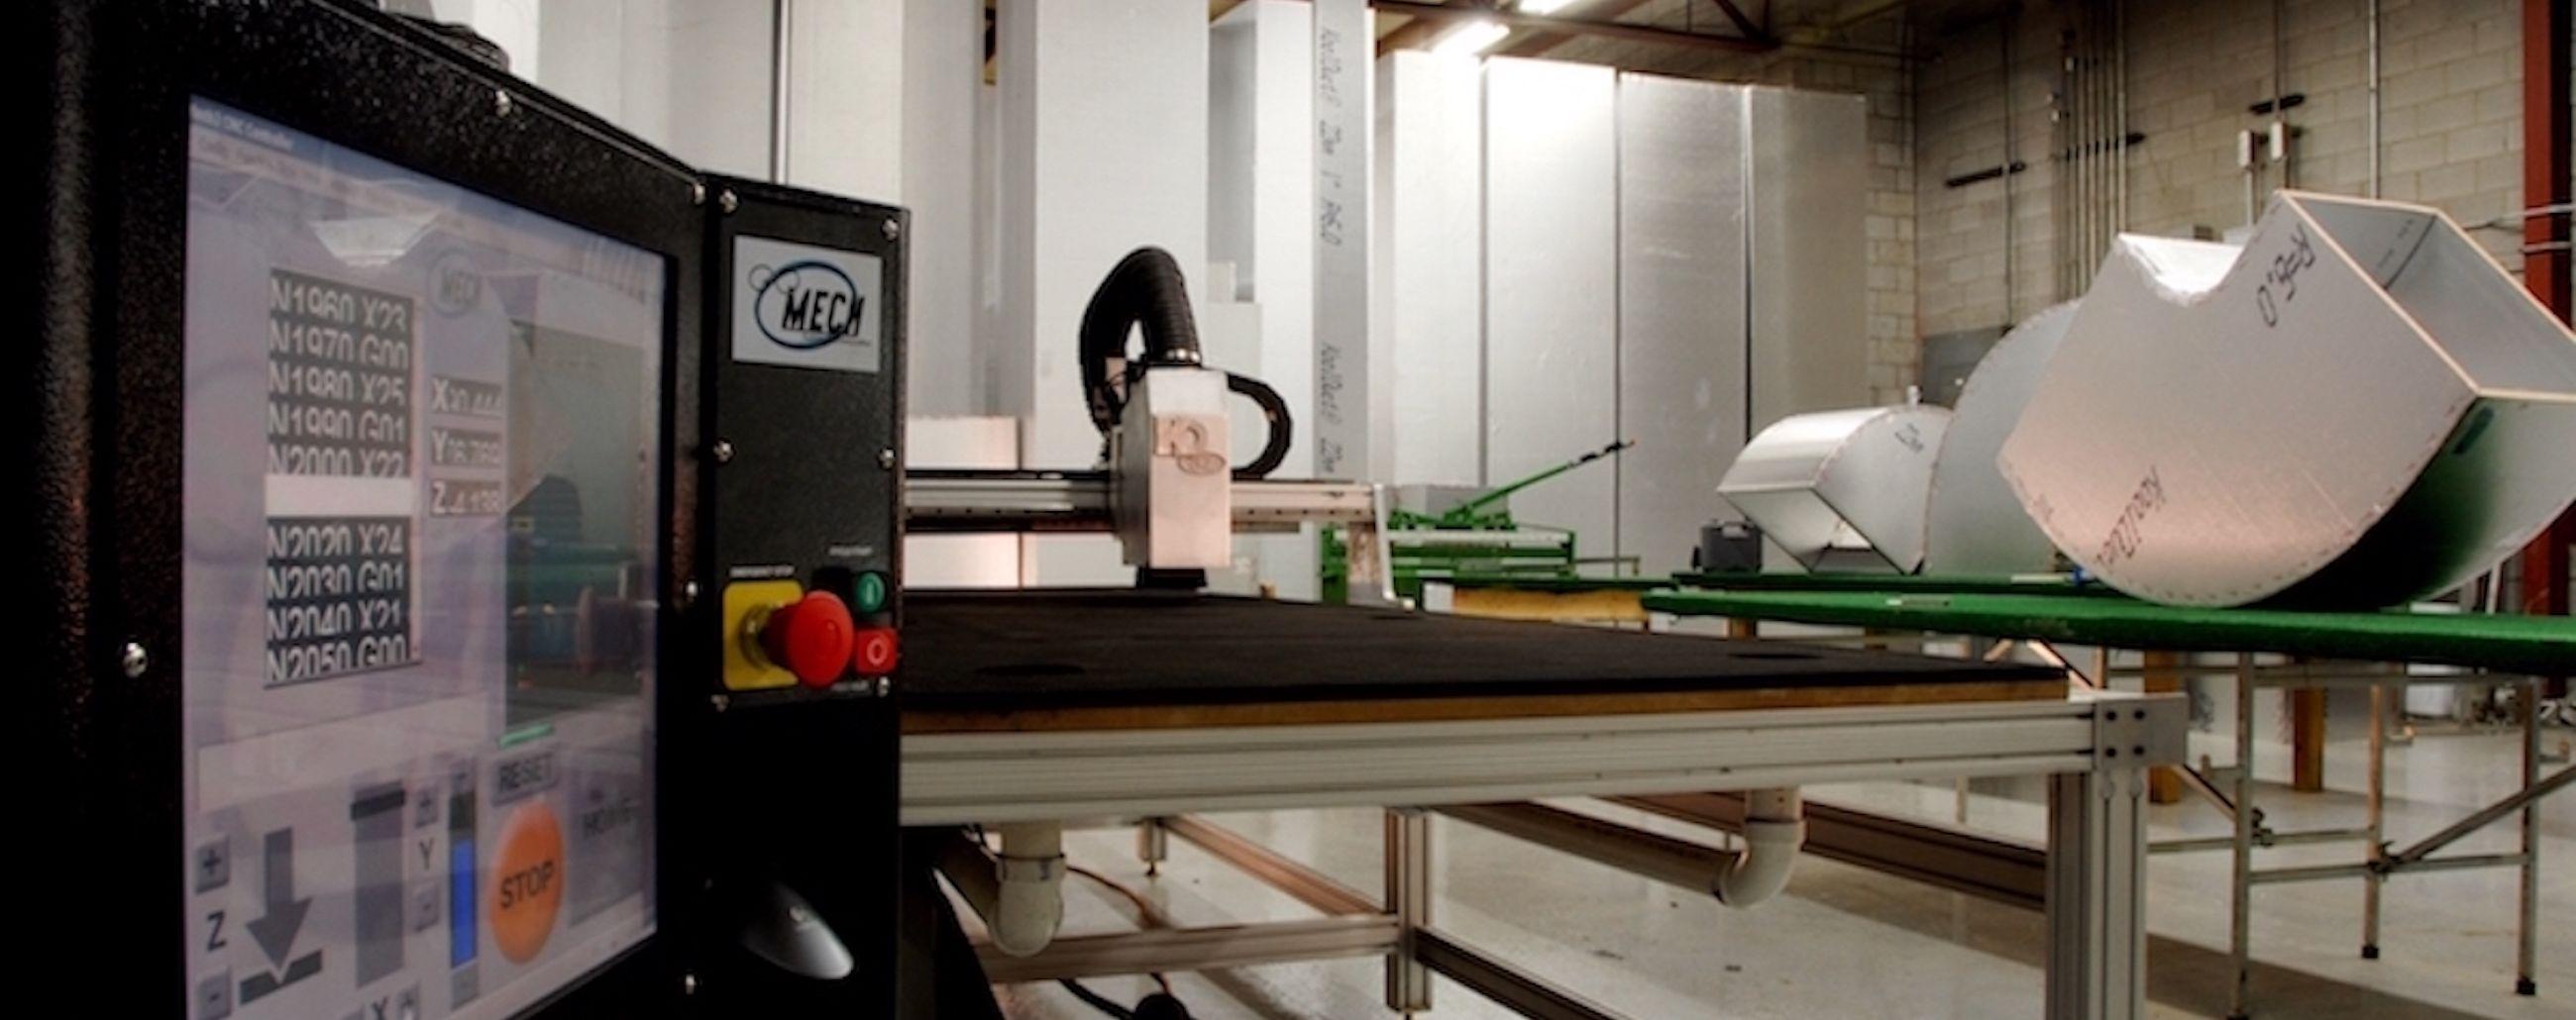 Phenolic Ductwork Fabrication Tools